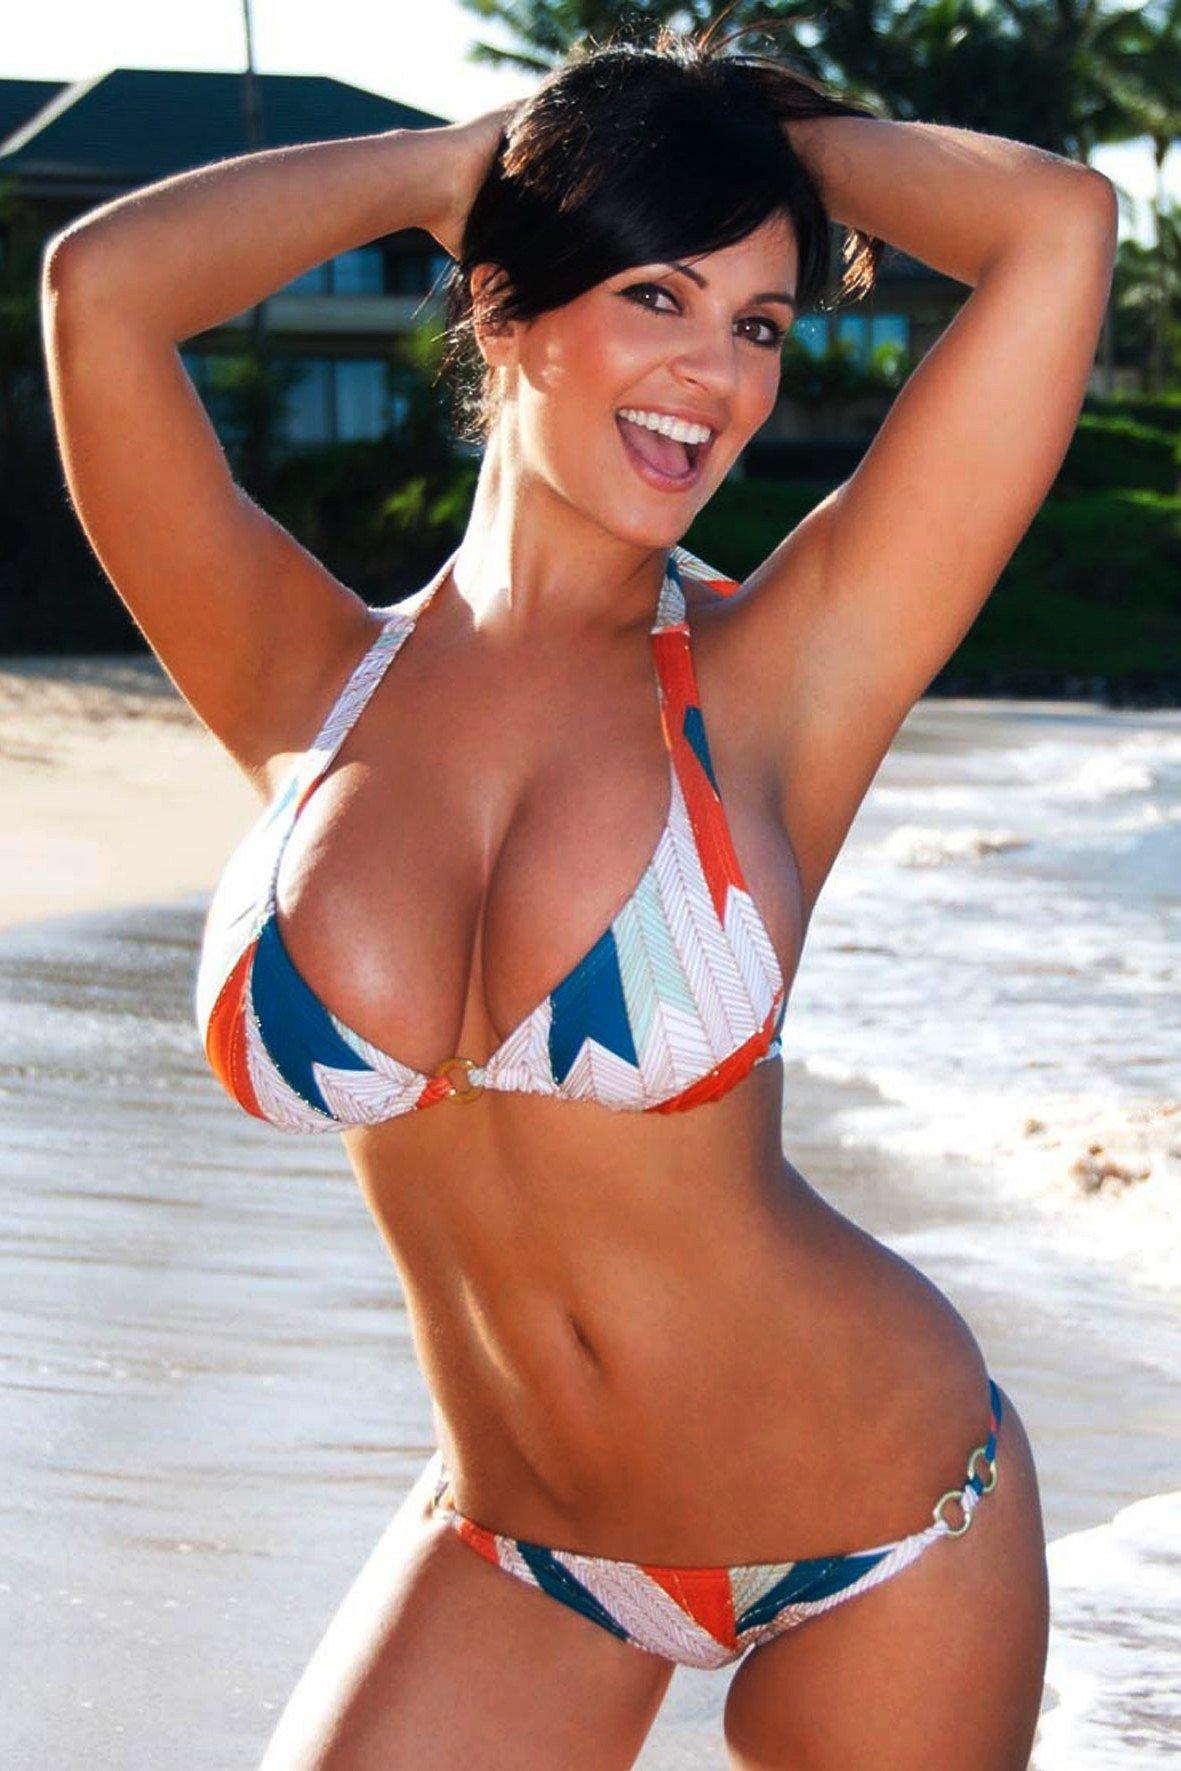 denise-milani-bikini-at-freeones